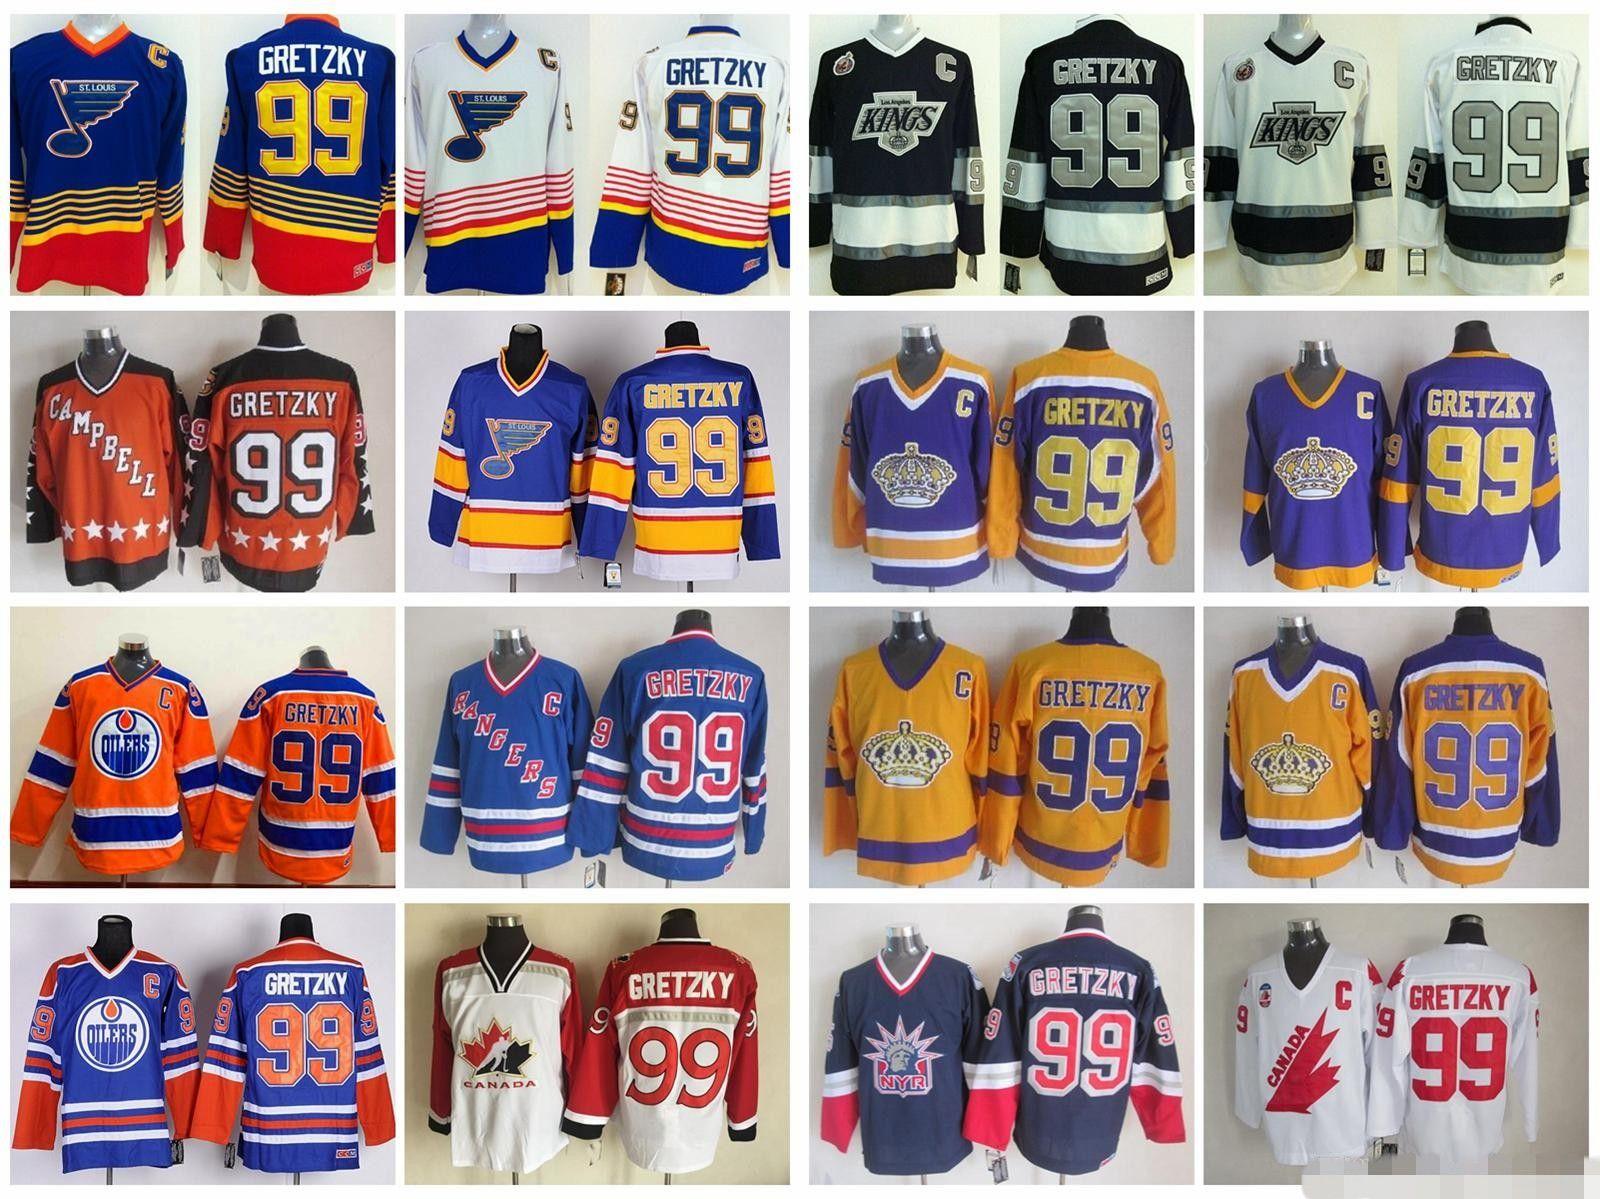 99 Wayne Gretzky Jersey Men Stitched Logo 1984 All Star New York Rangers LA Kings St. Louis Blues Hockey Gretzky Vintage Maglie